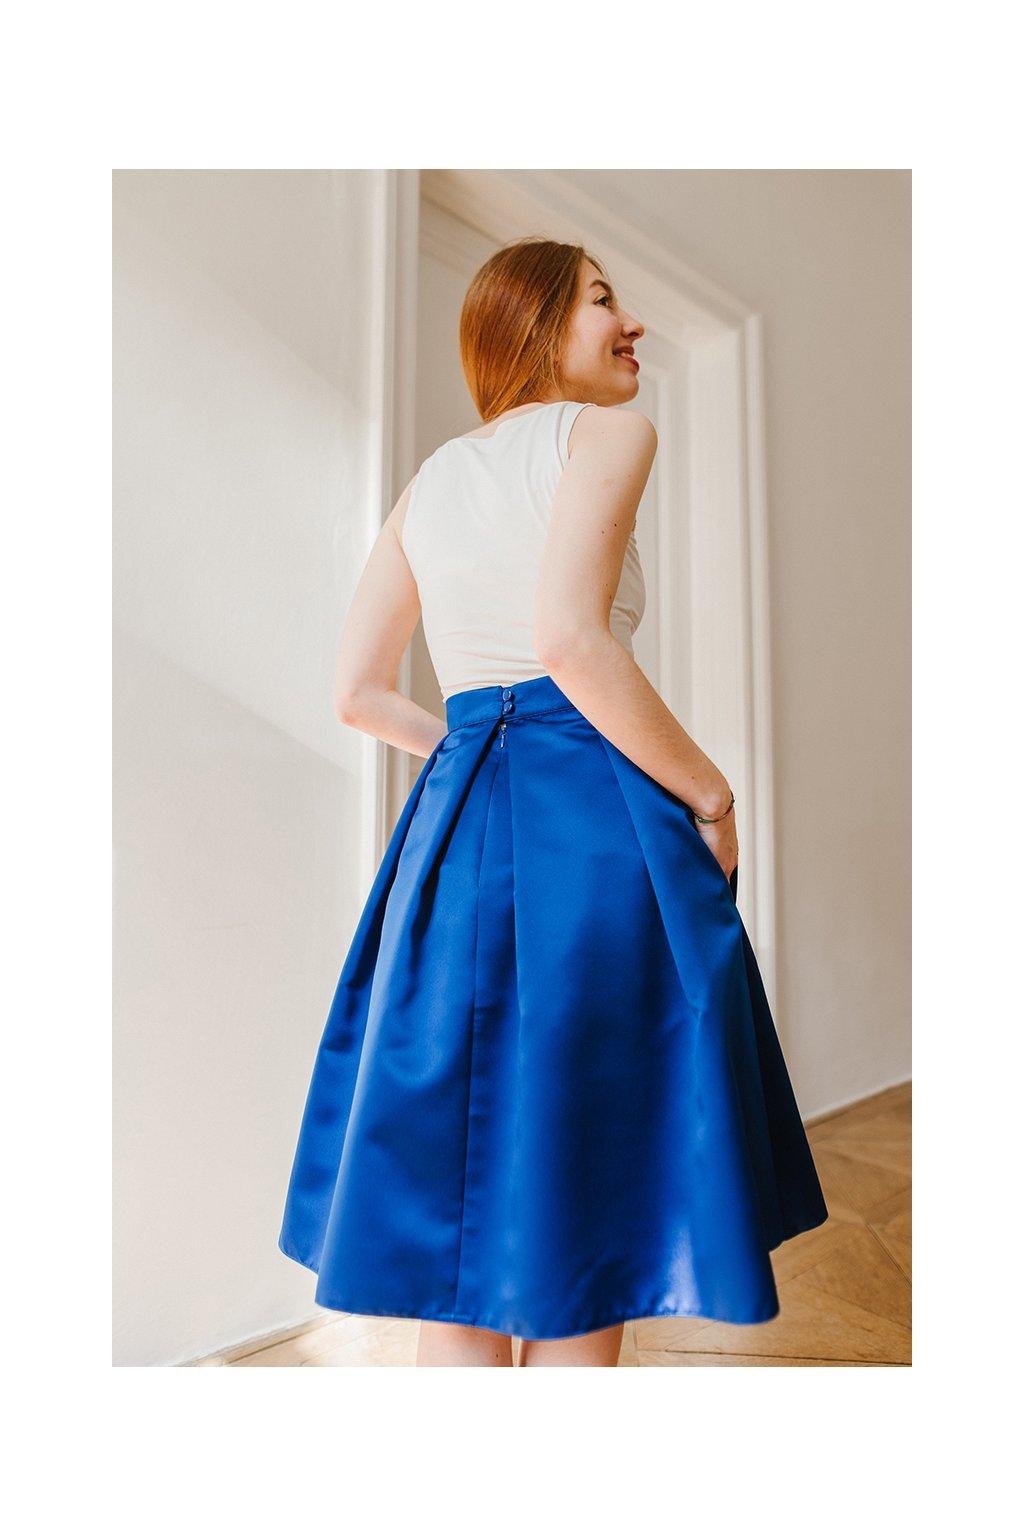 Reparada sukne pro princezny s tylem kralovsky modra1